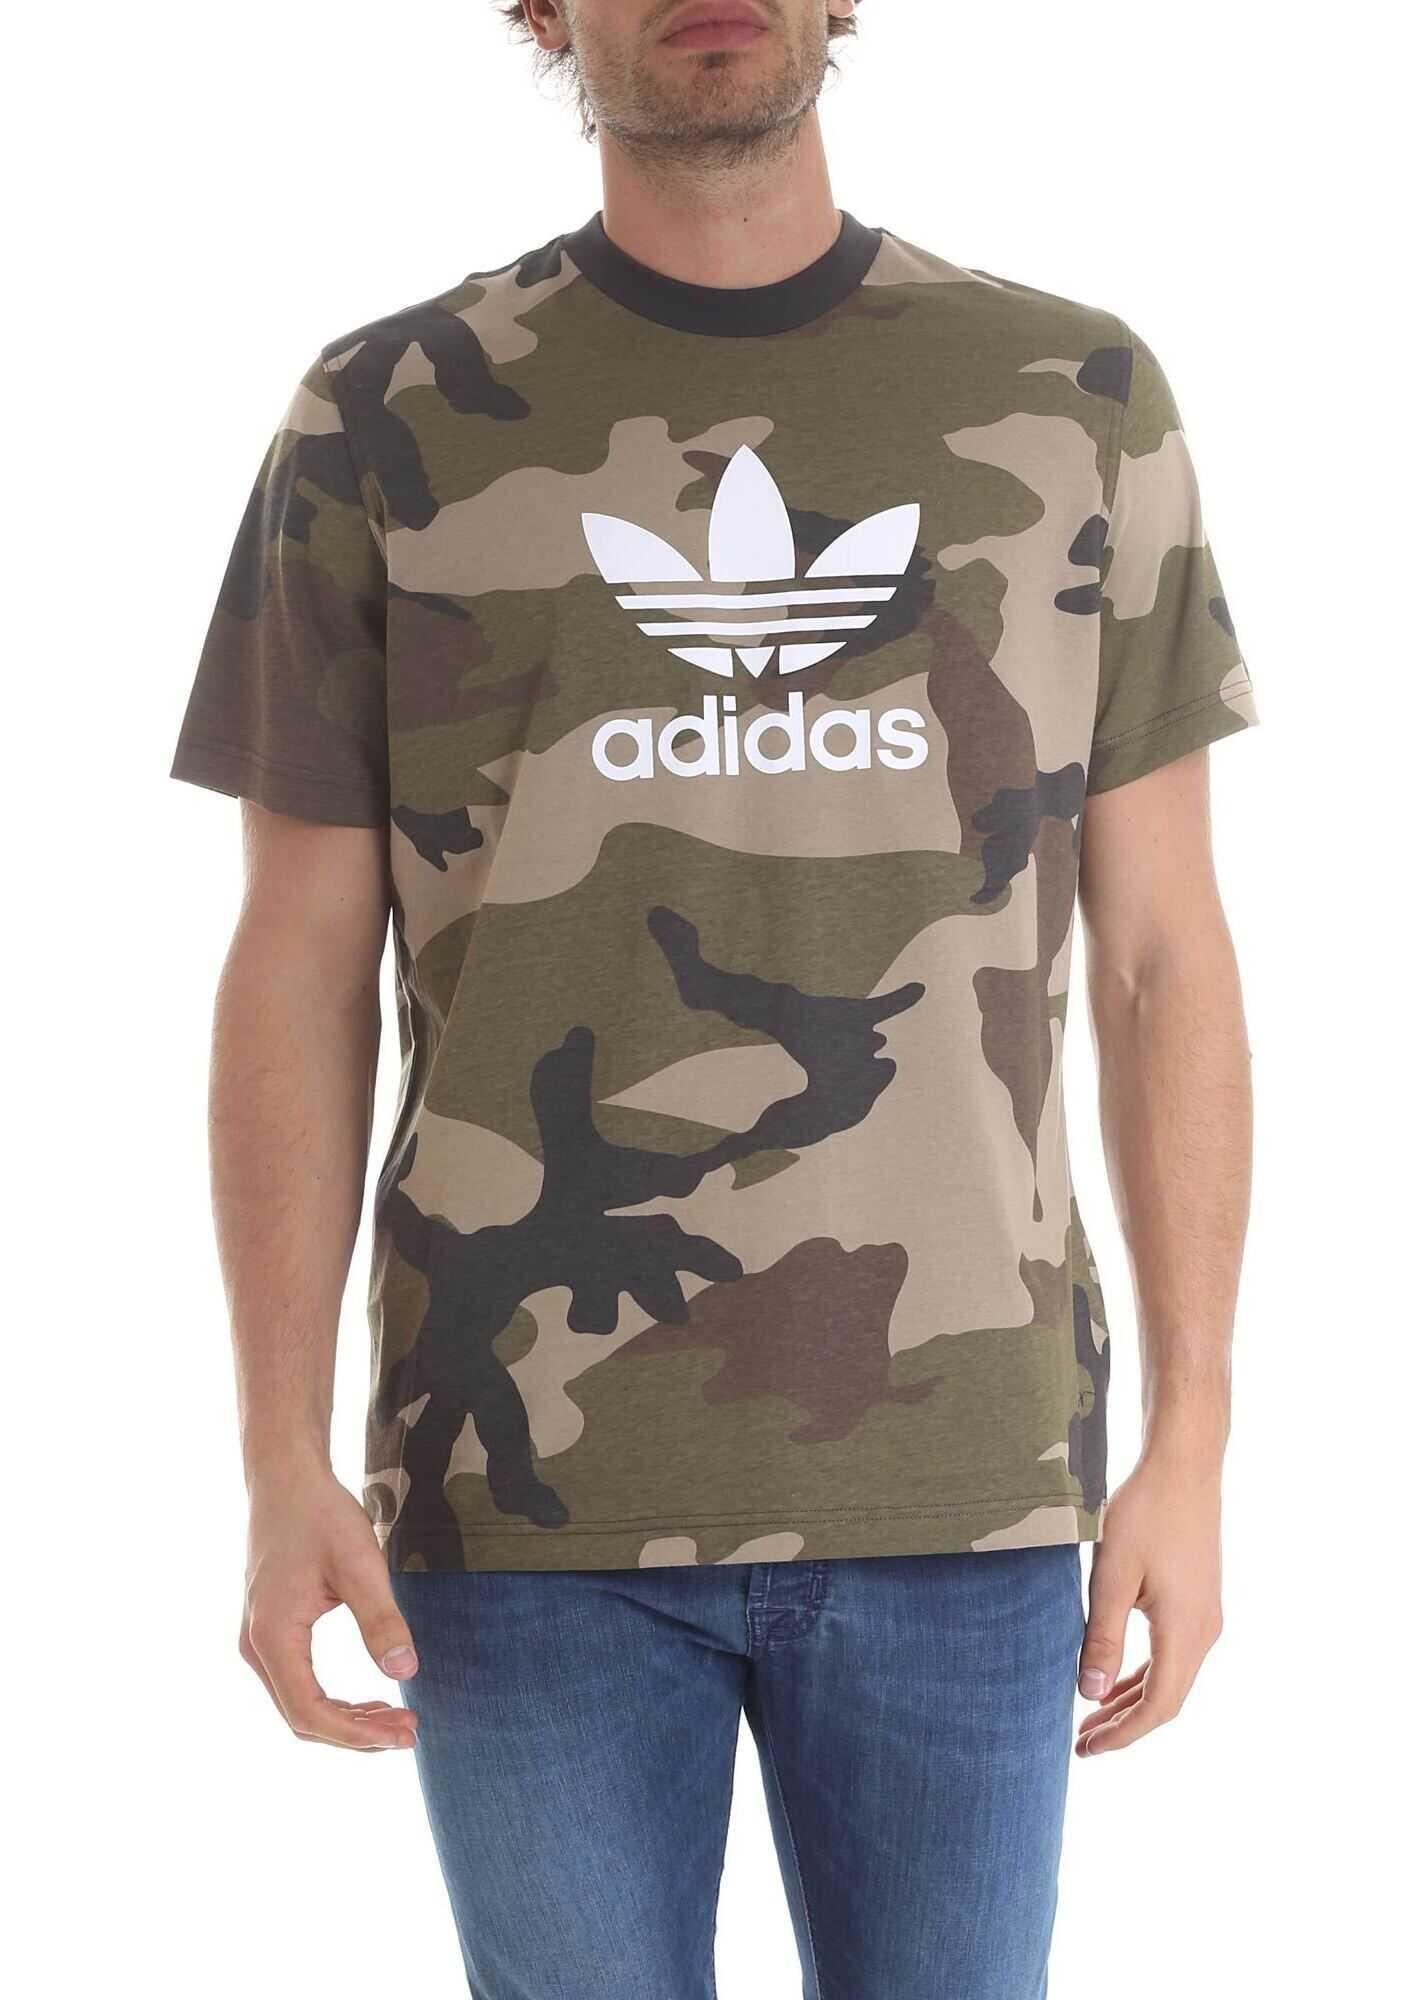 Adidas Originals Camo T-Shirt In Green